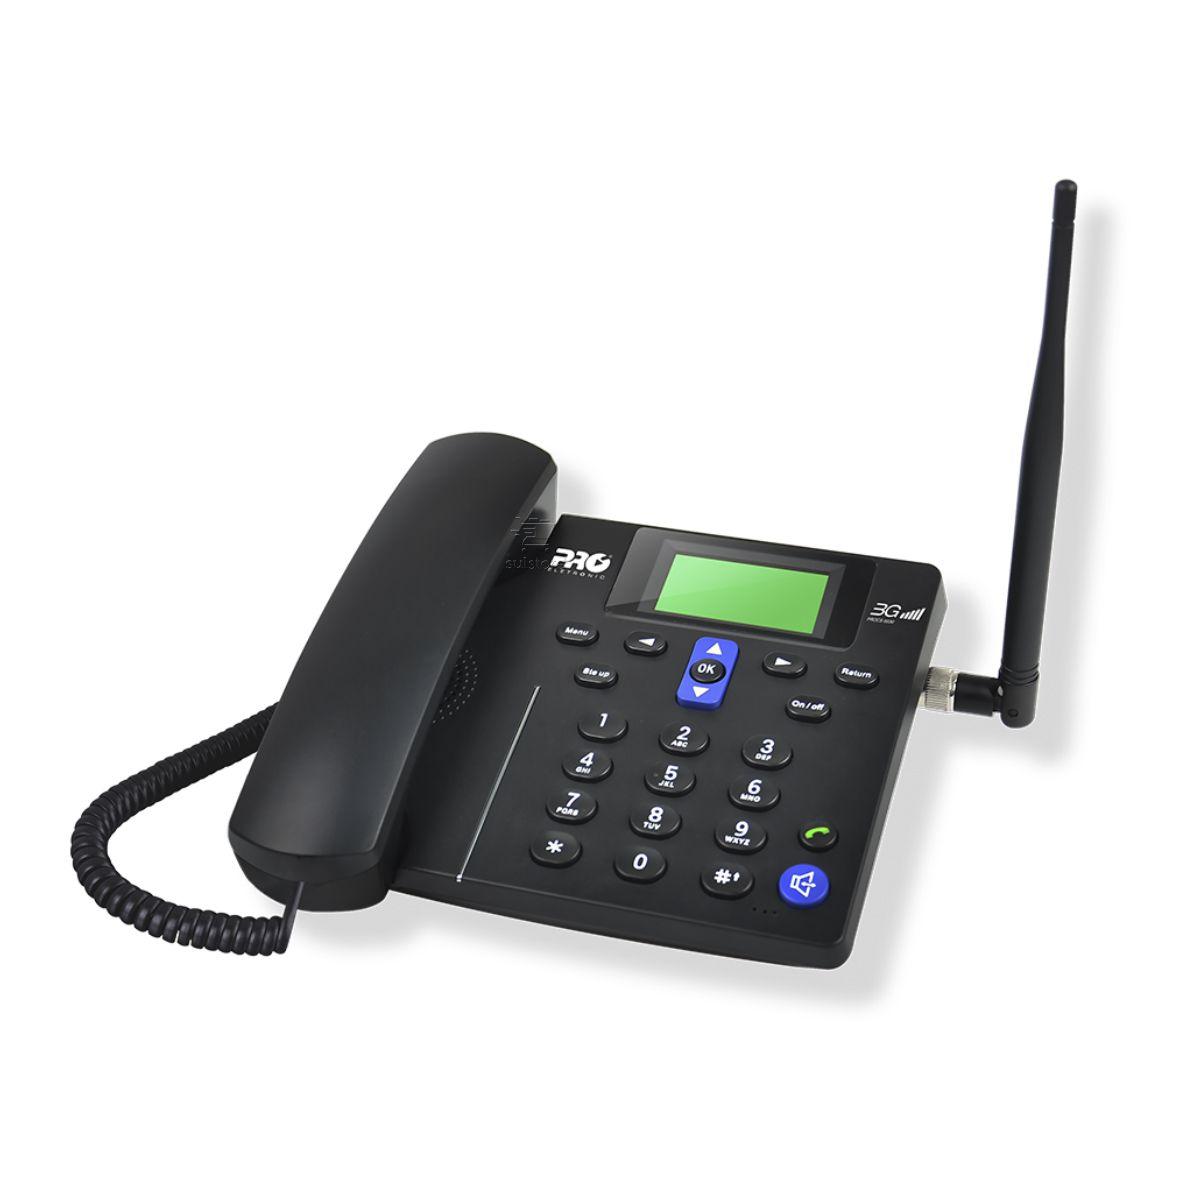 Telefone Celular de Mesa Rural Fazenda Pro Eletronic PROCS-5030 3G Desbloqueado